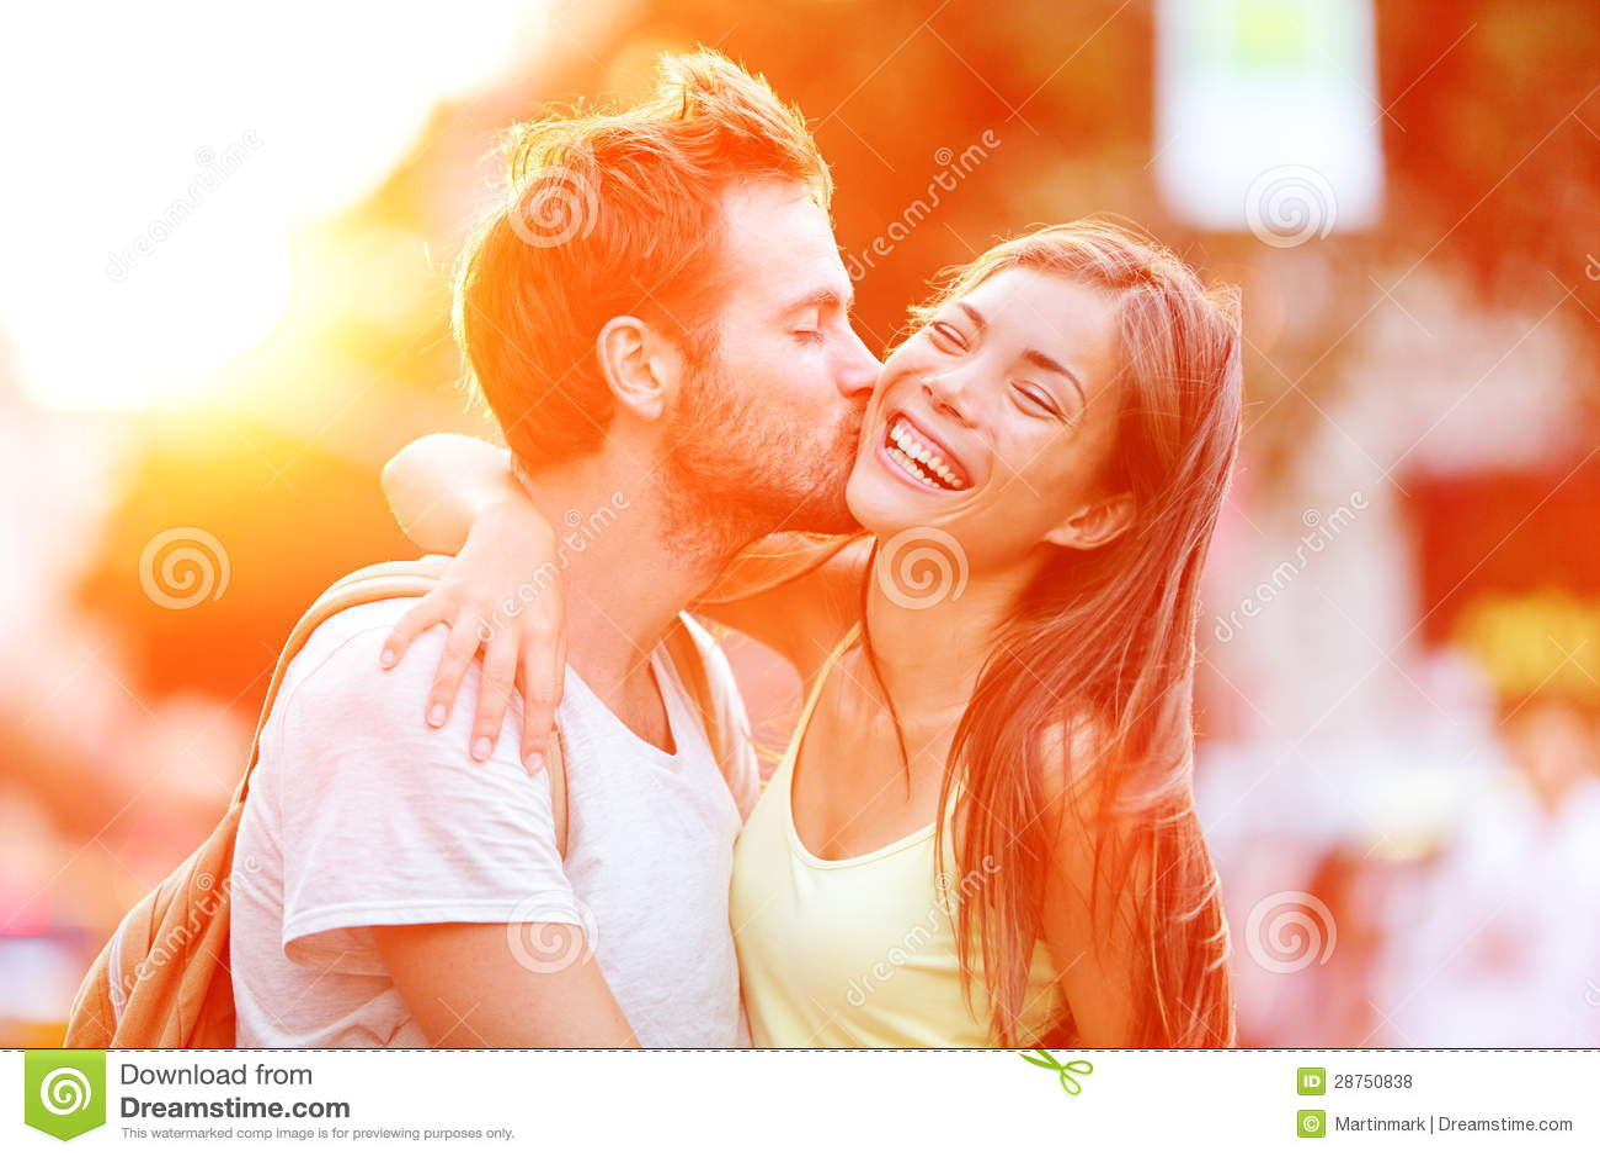 Couple kissing fun